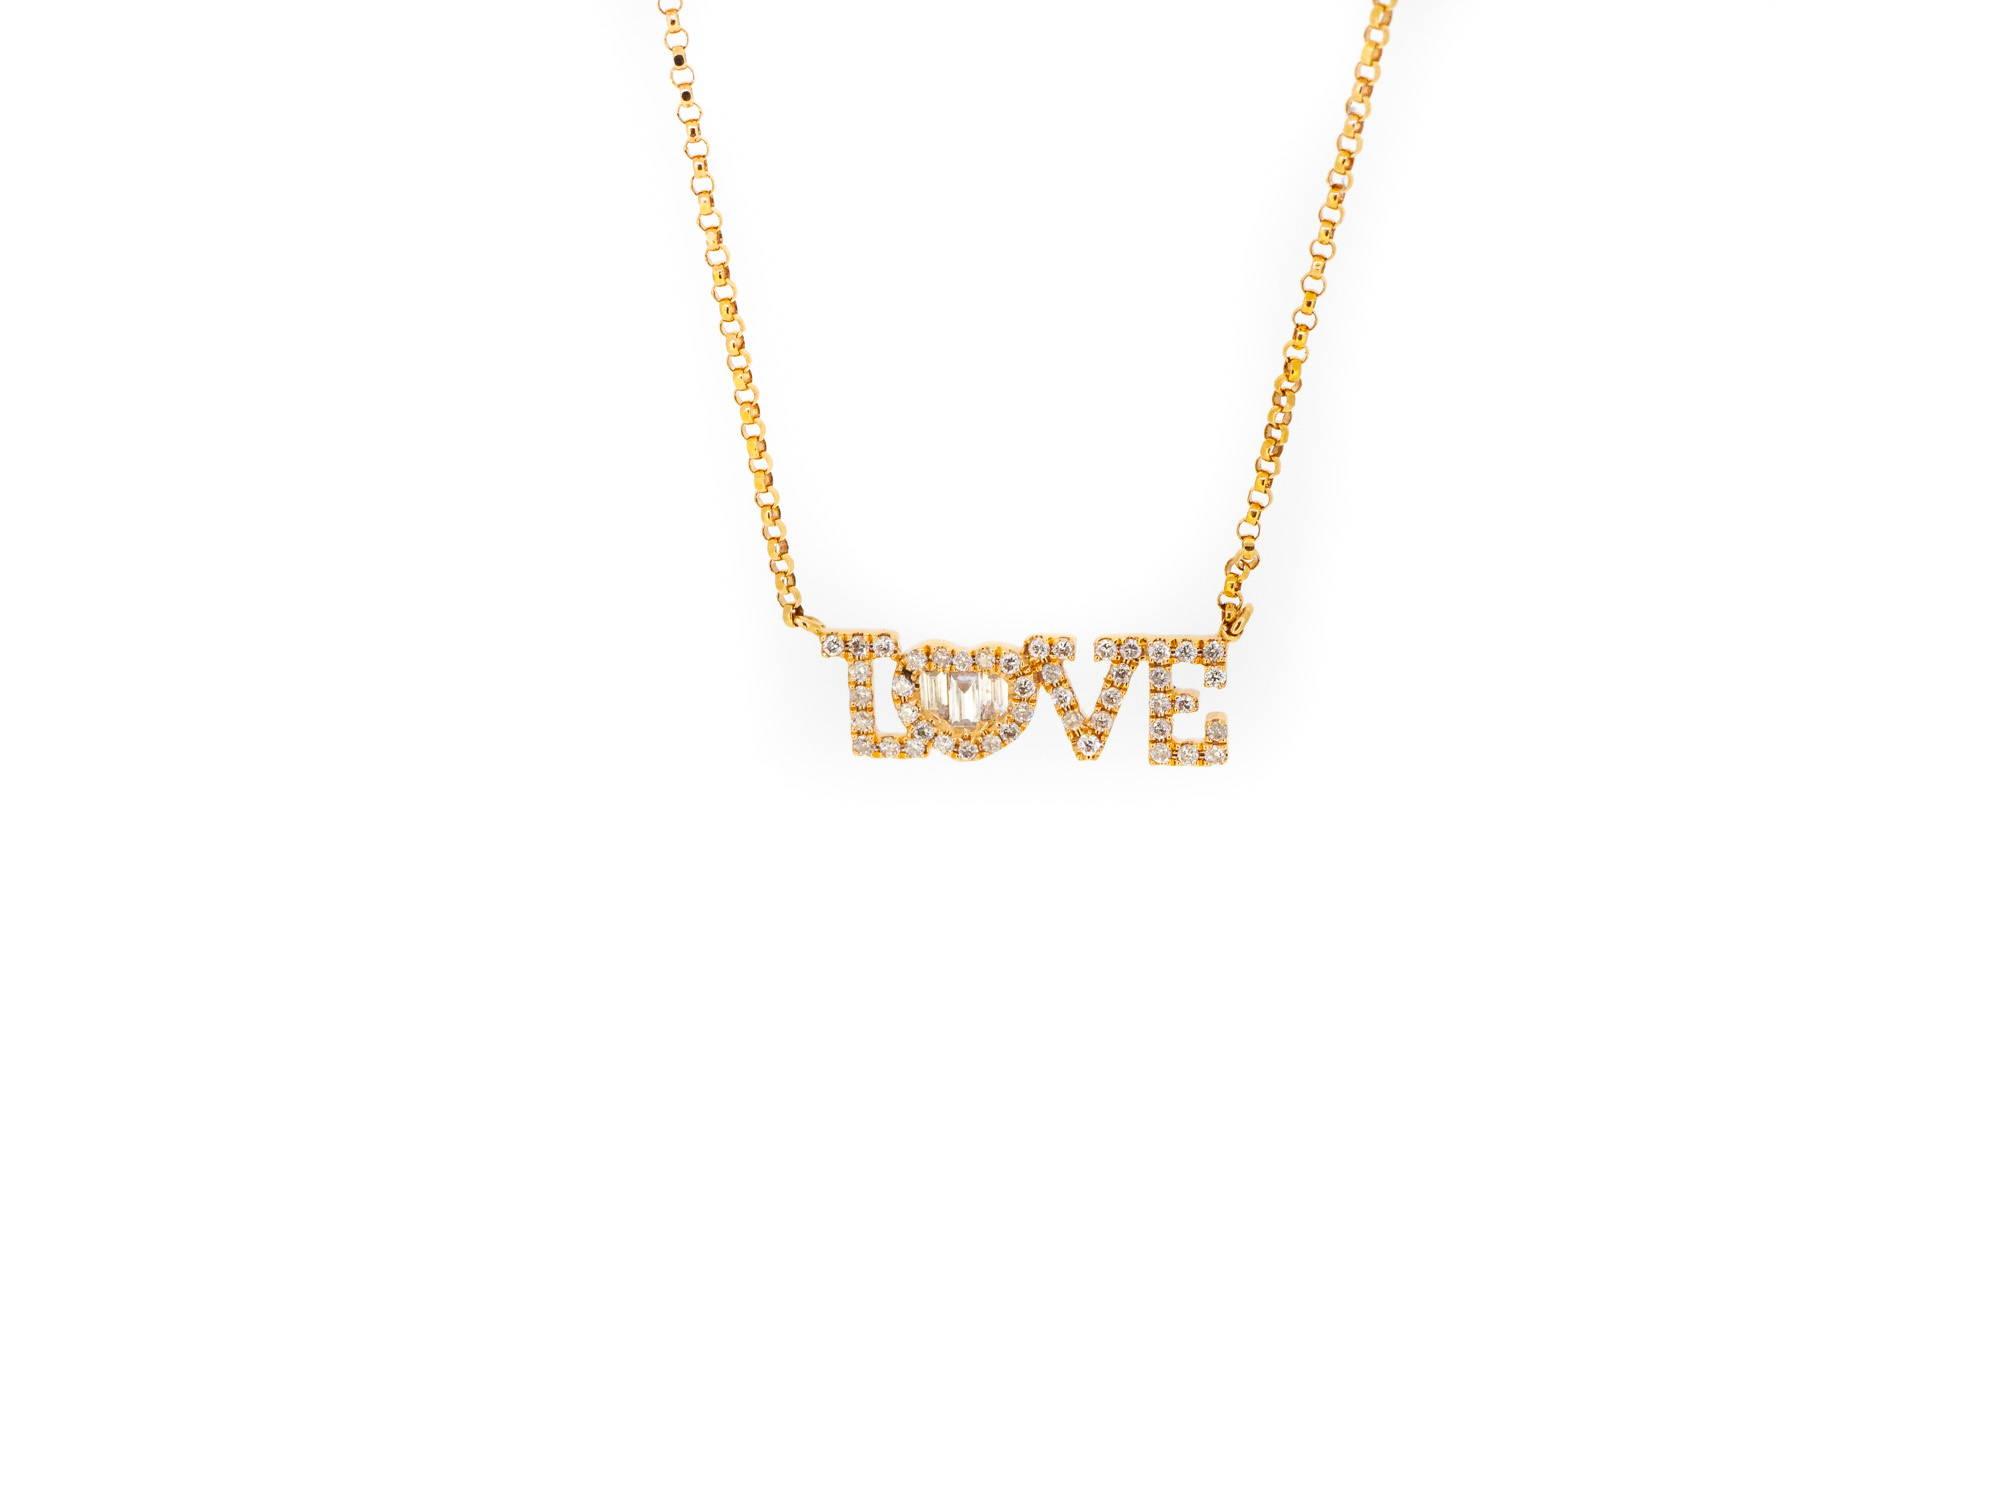 https://mickysjewelrystudio.com/products/love-necklace